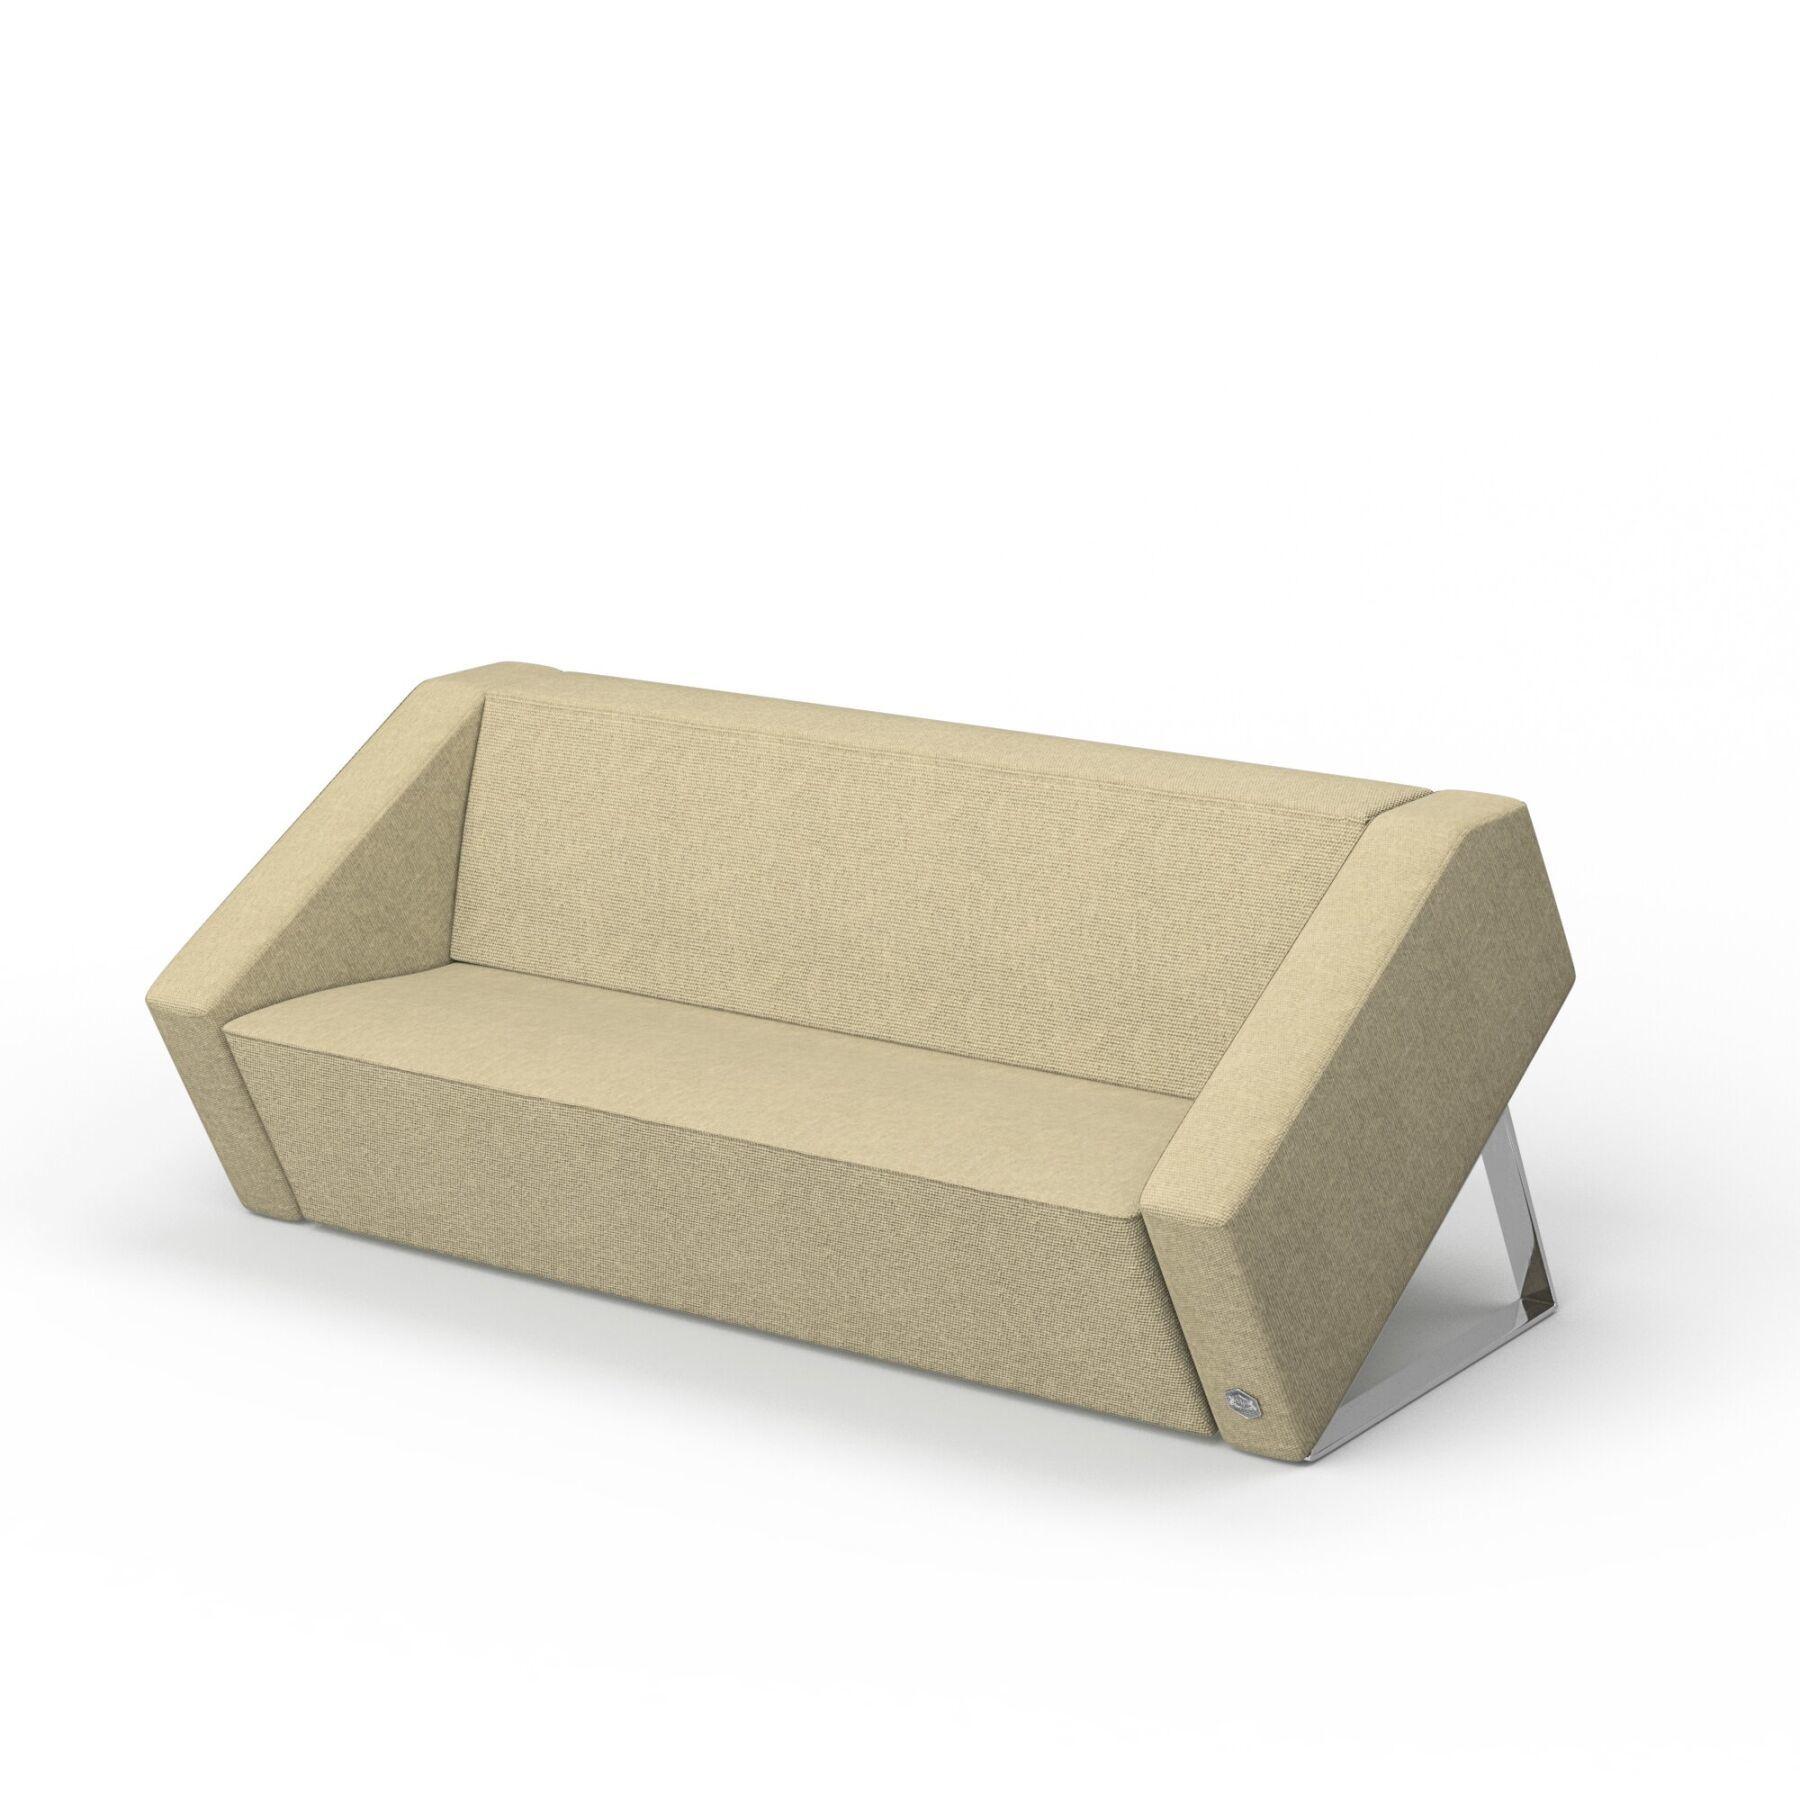 Трехместный диван KULIK SYSTEM PLANE Ткань 3